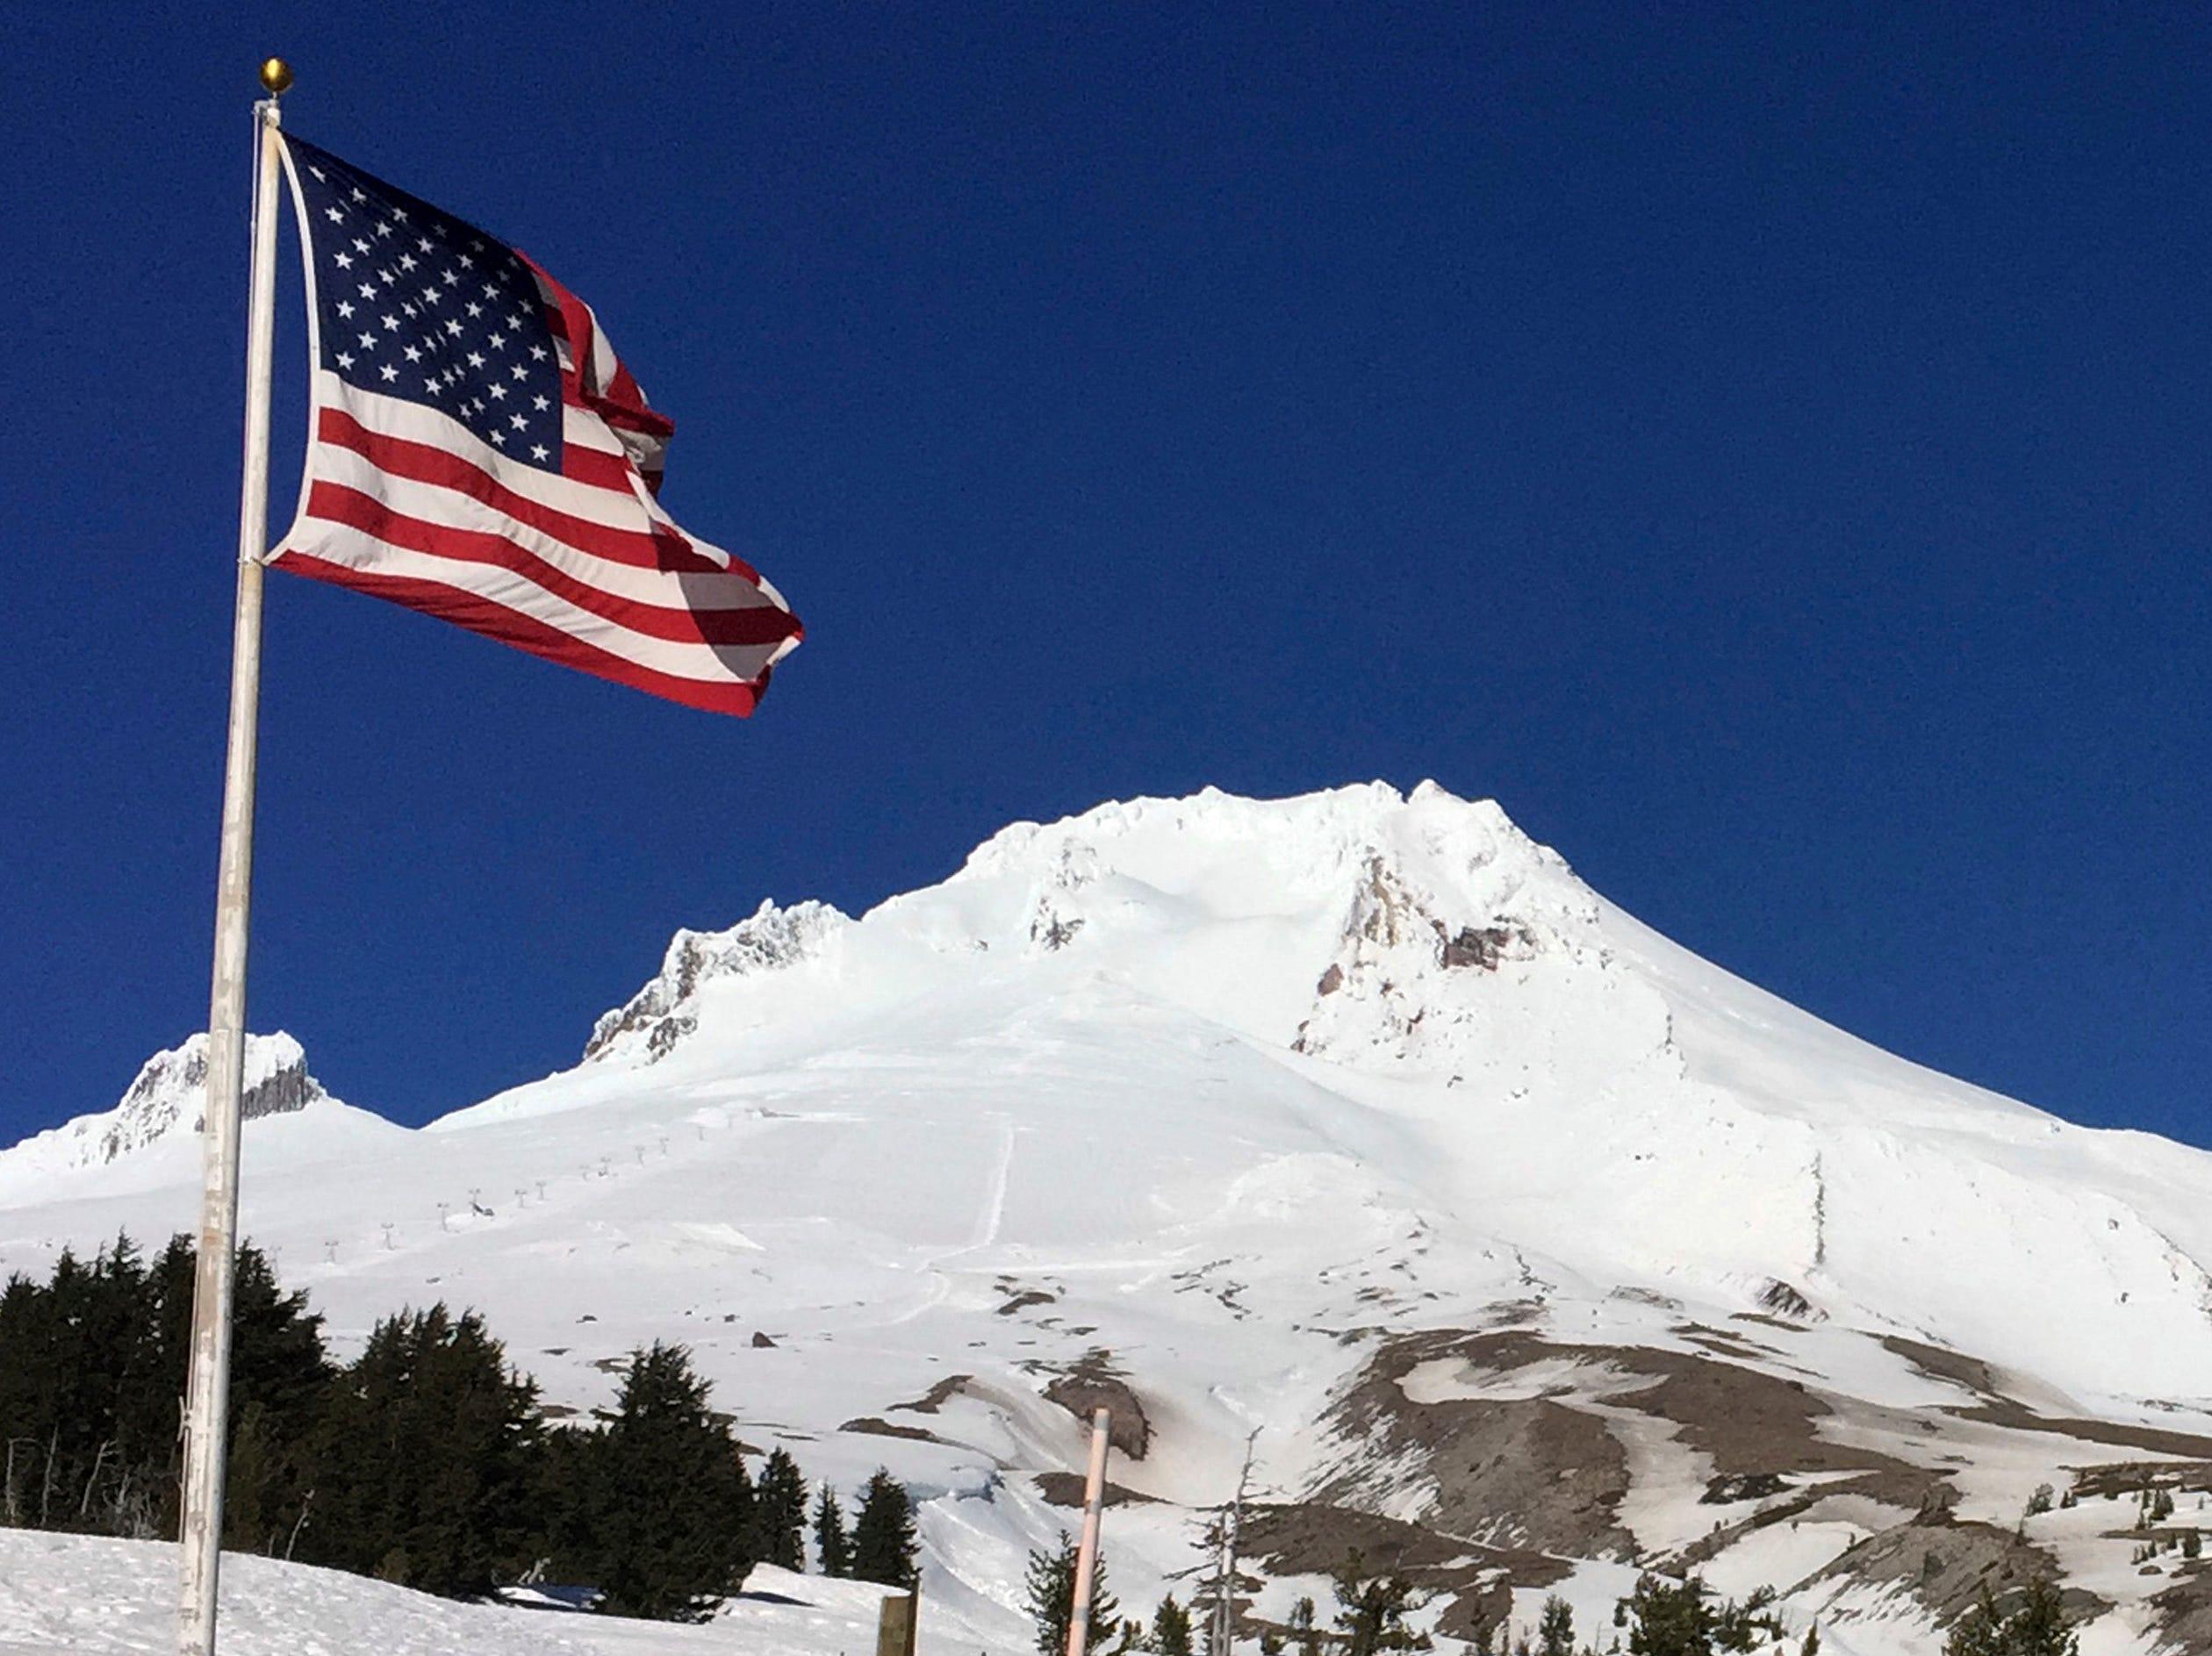 37. Oregon > Highest peak: Mount Hood > Elevation above sea level: 11,239 ft. > Coordinates: 45.4° N, 121.7° W